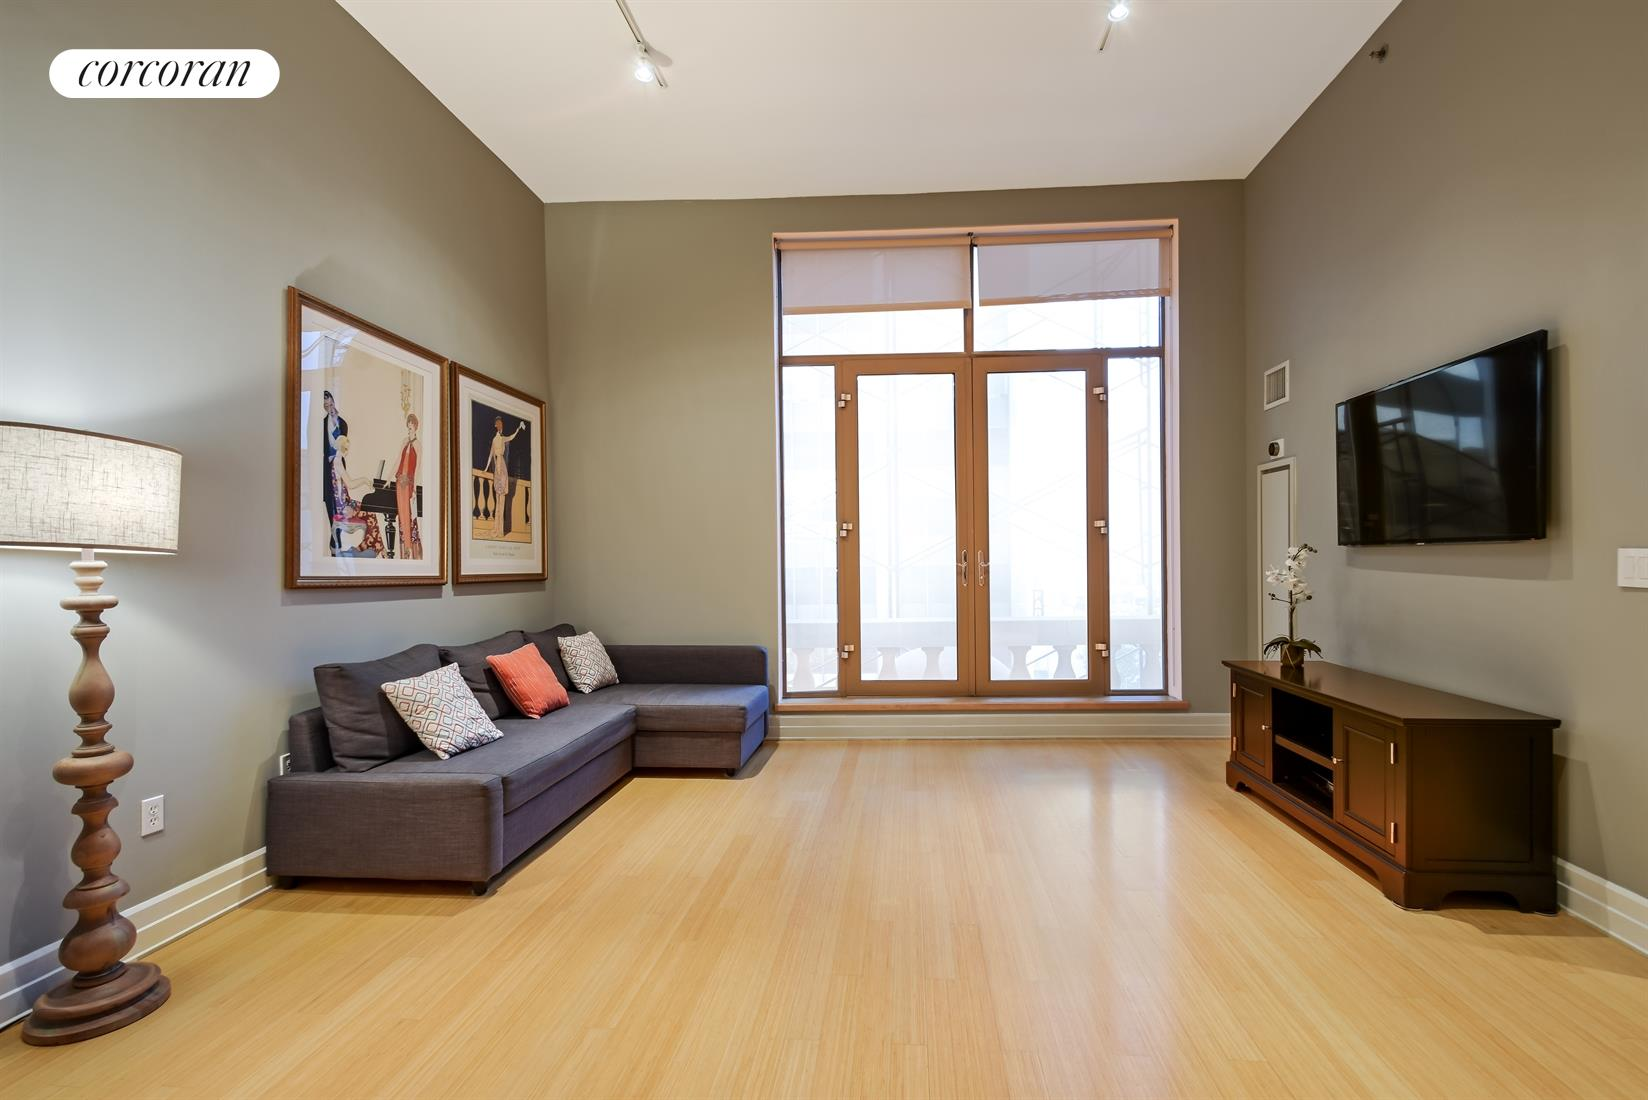 Condominium for Sale at 110 Livingston Street 4-E 110 Livingston Street Brooklyn, New York 11201 United States